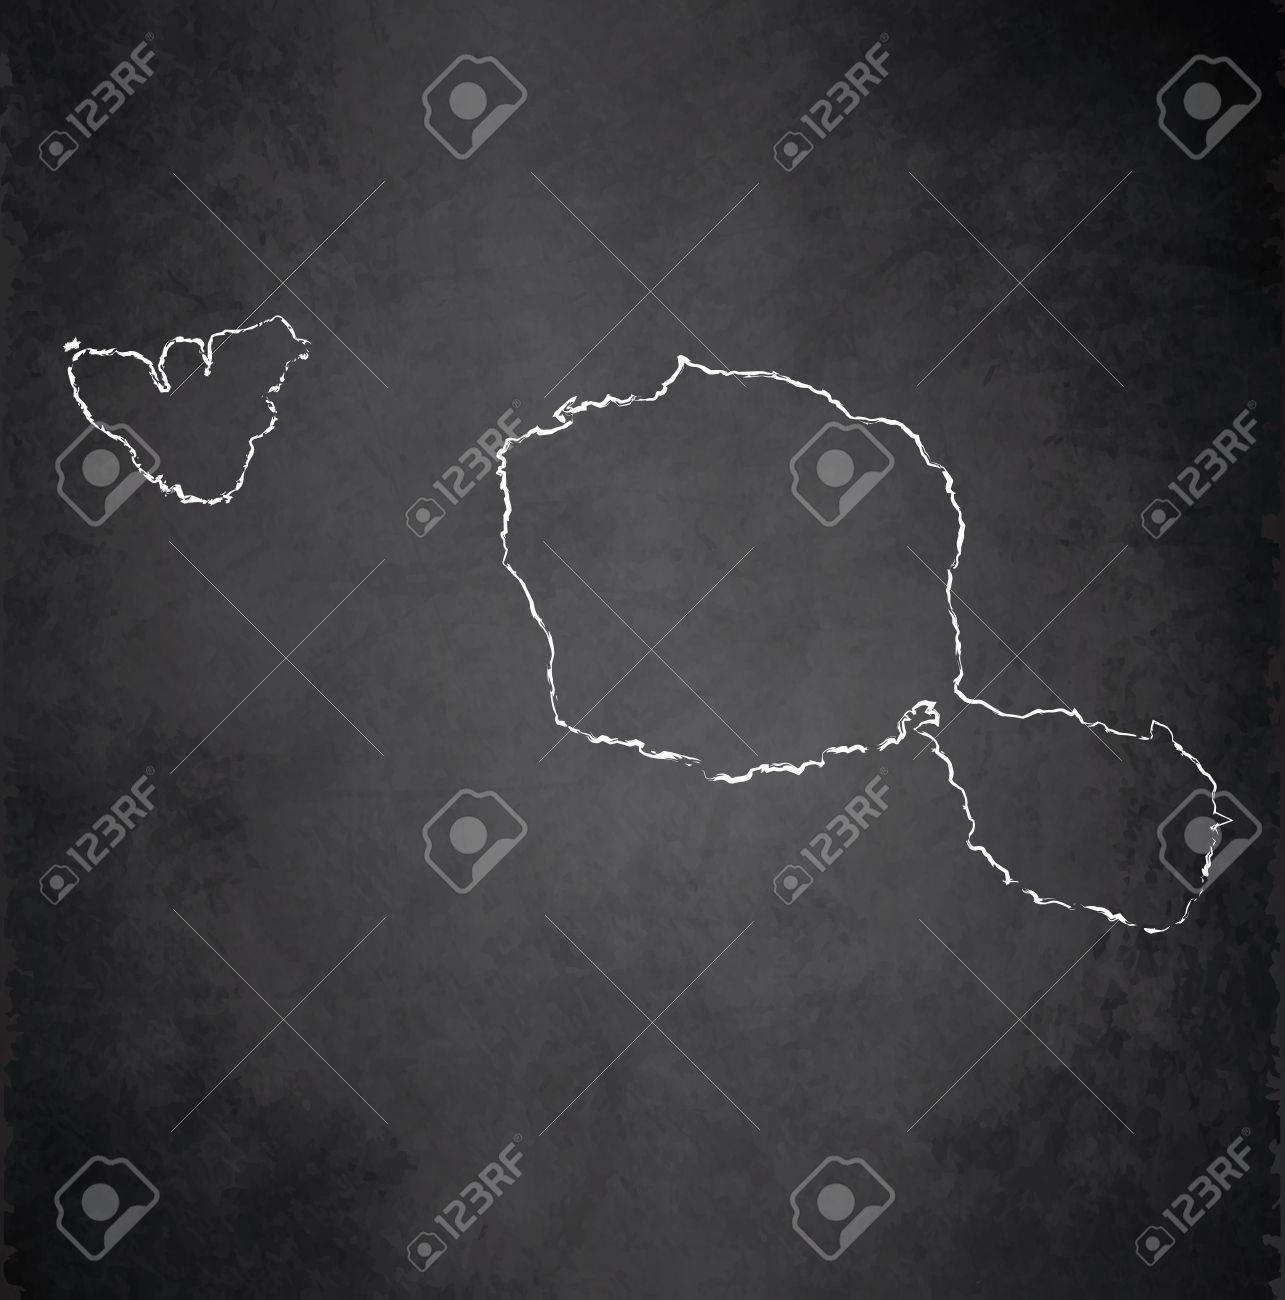 Tahiti map blackboard chalkboard raster French Polynesia